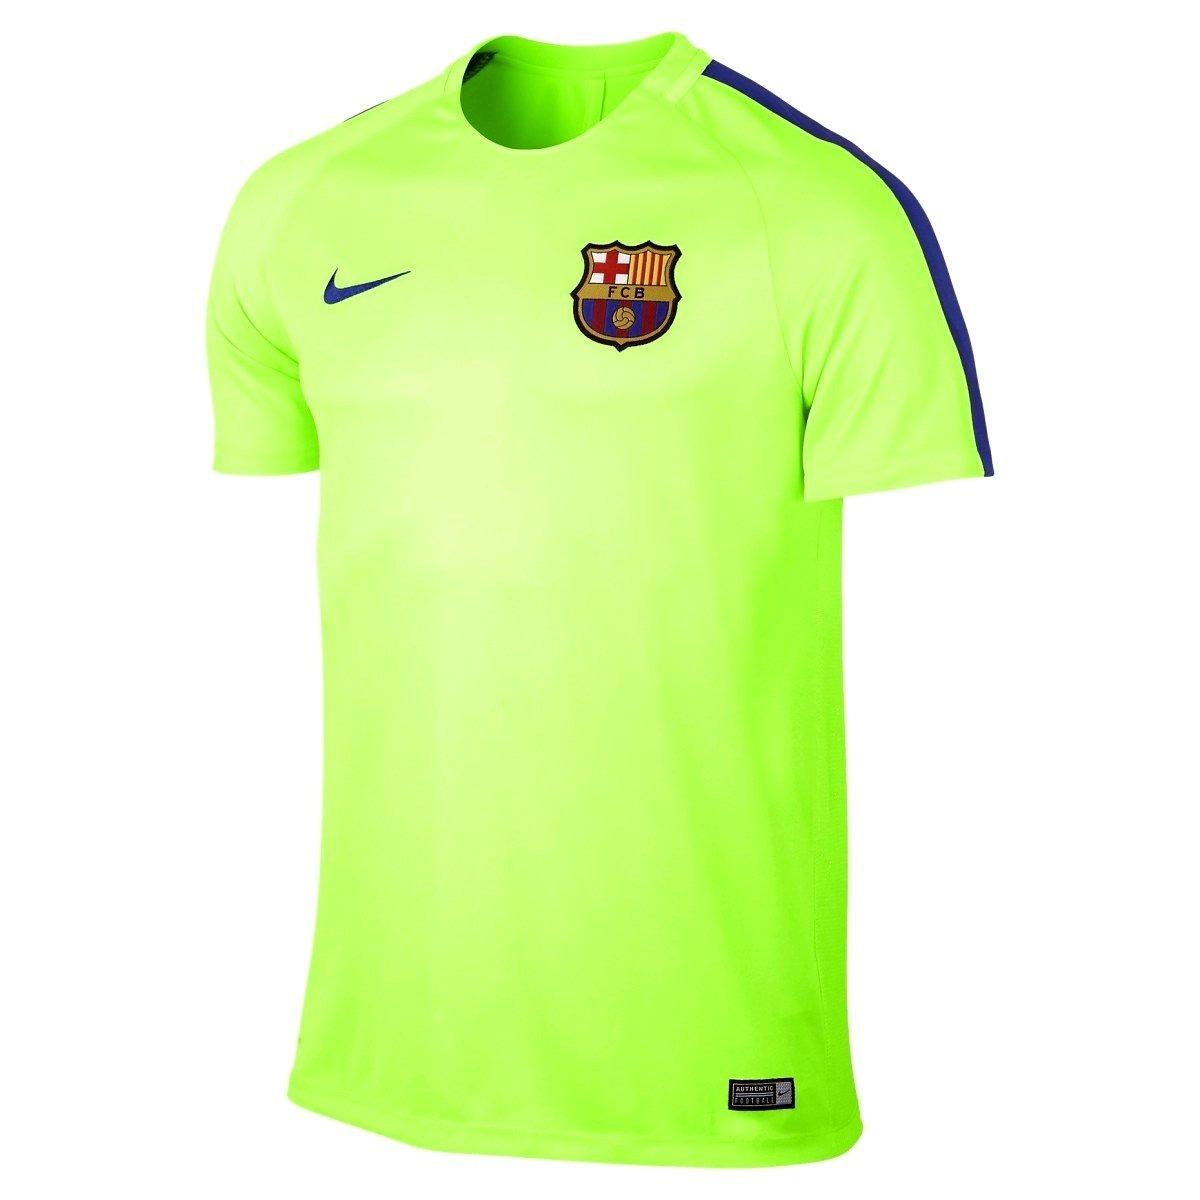 Camiseta Nike Fc Barcelona Dry Top Squad 16 17 808924-369 - R  149 ... 9b48d41cfd9e6